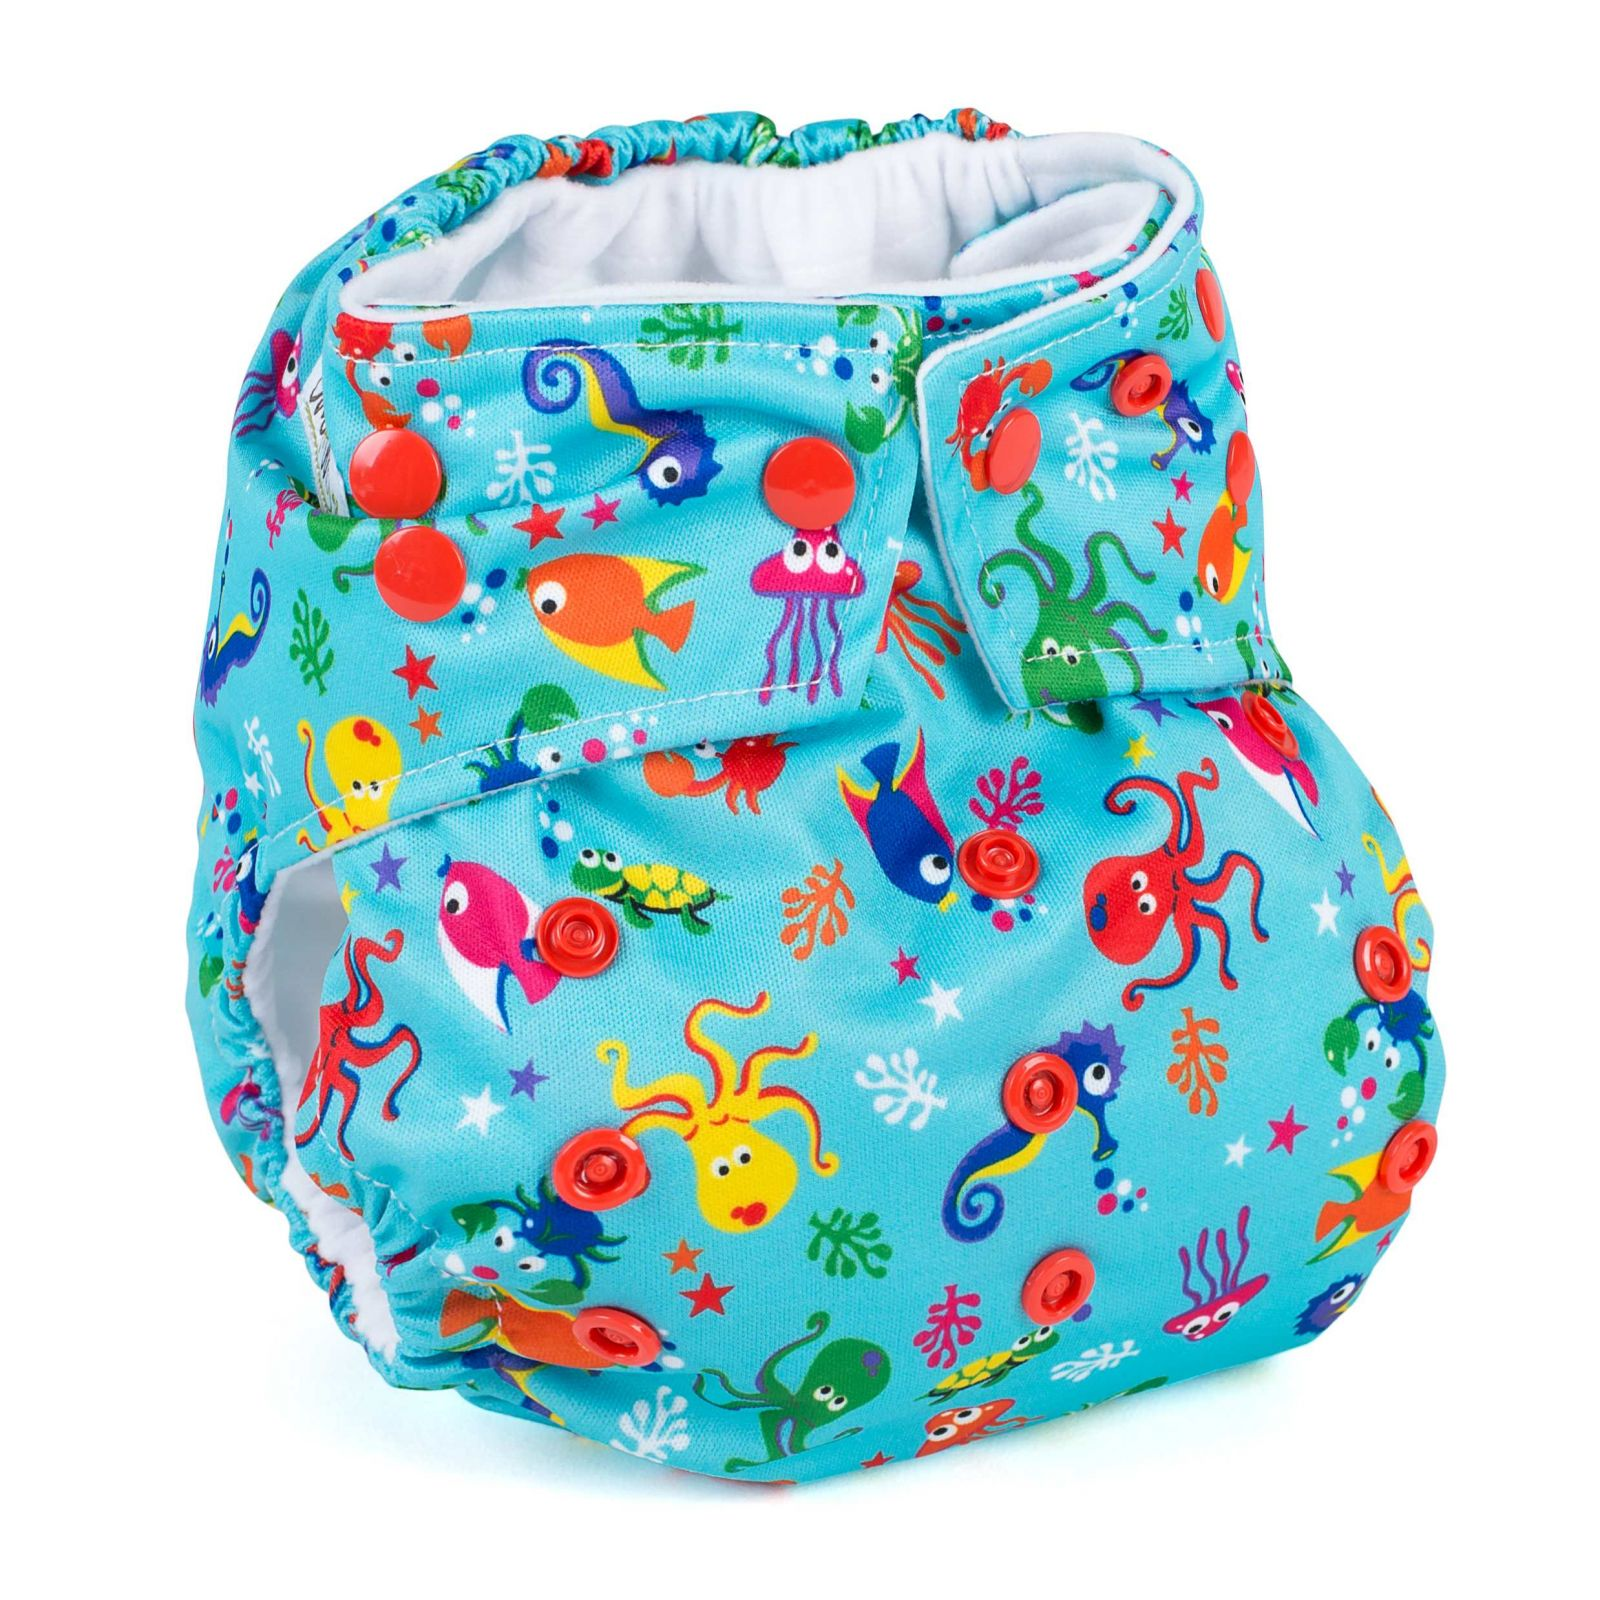 Baba+Boo plenkové kalhotky V2, Design Deap Sea